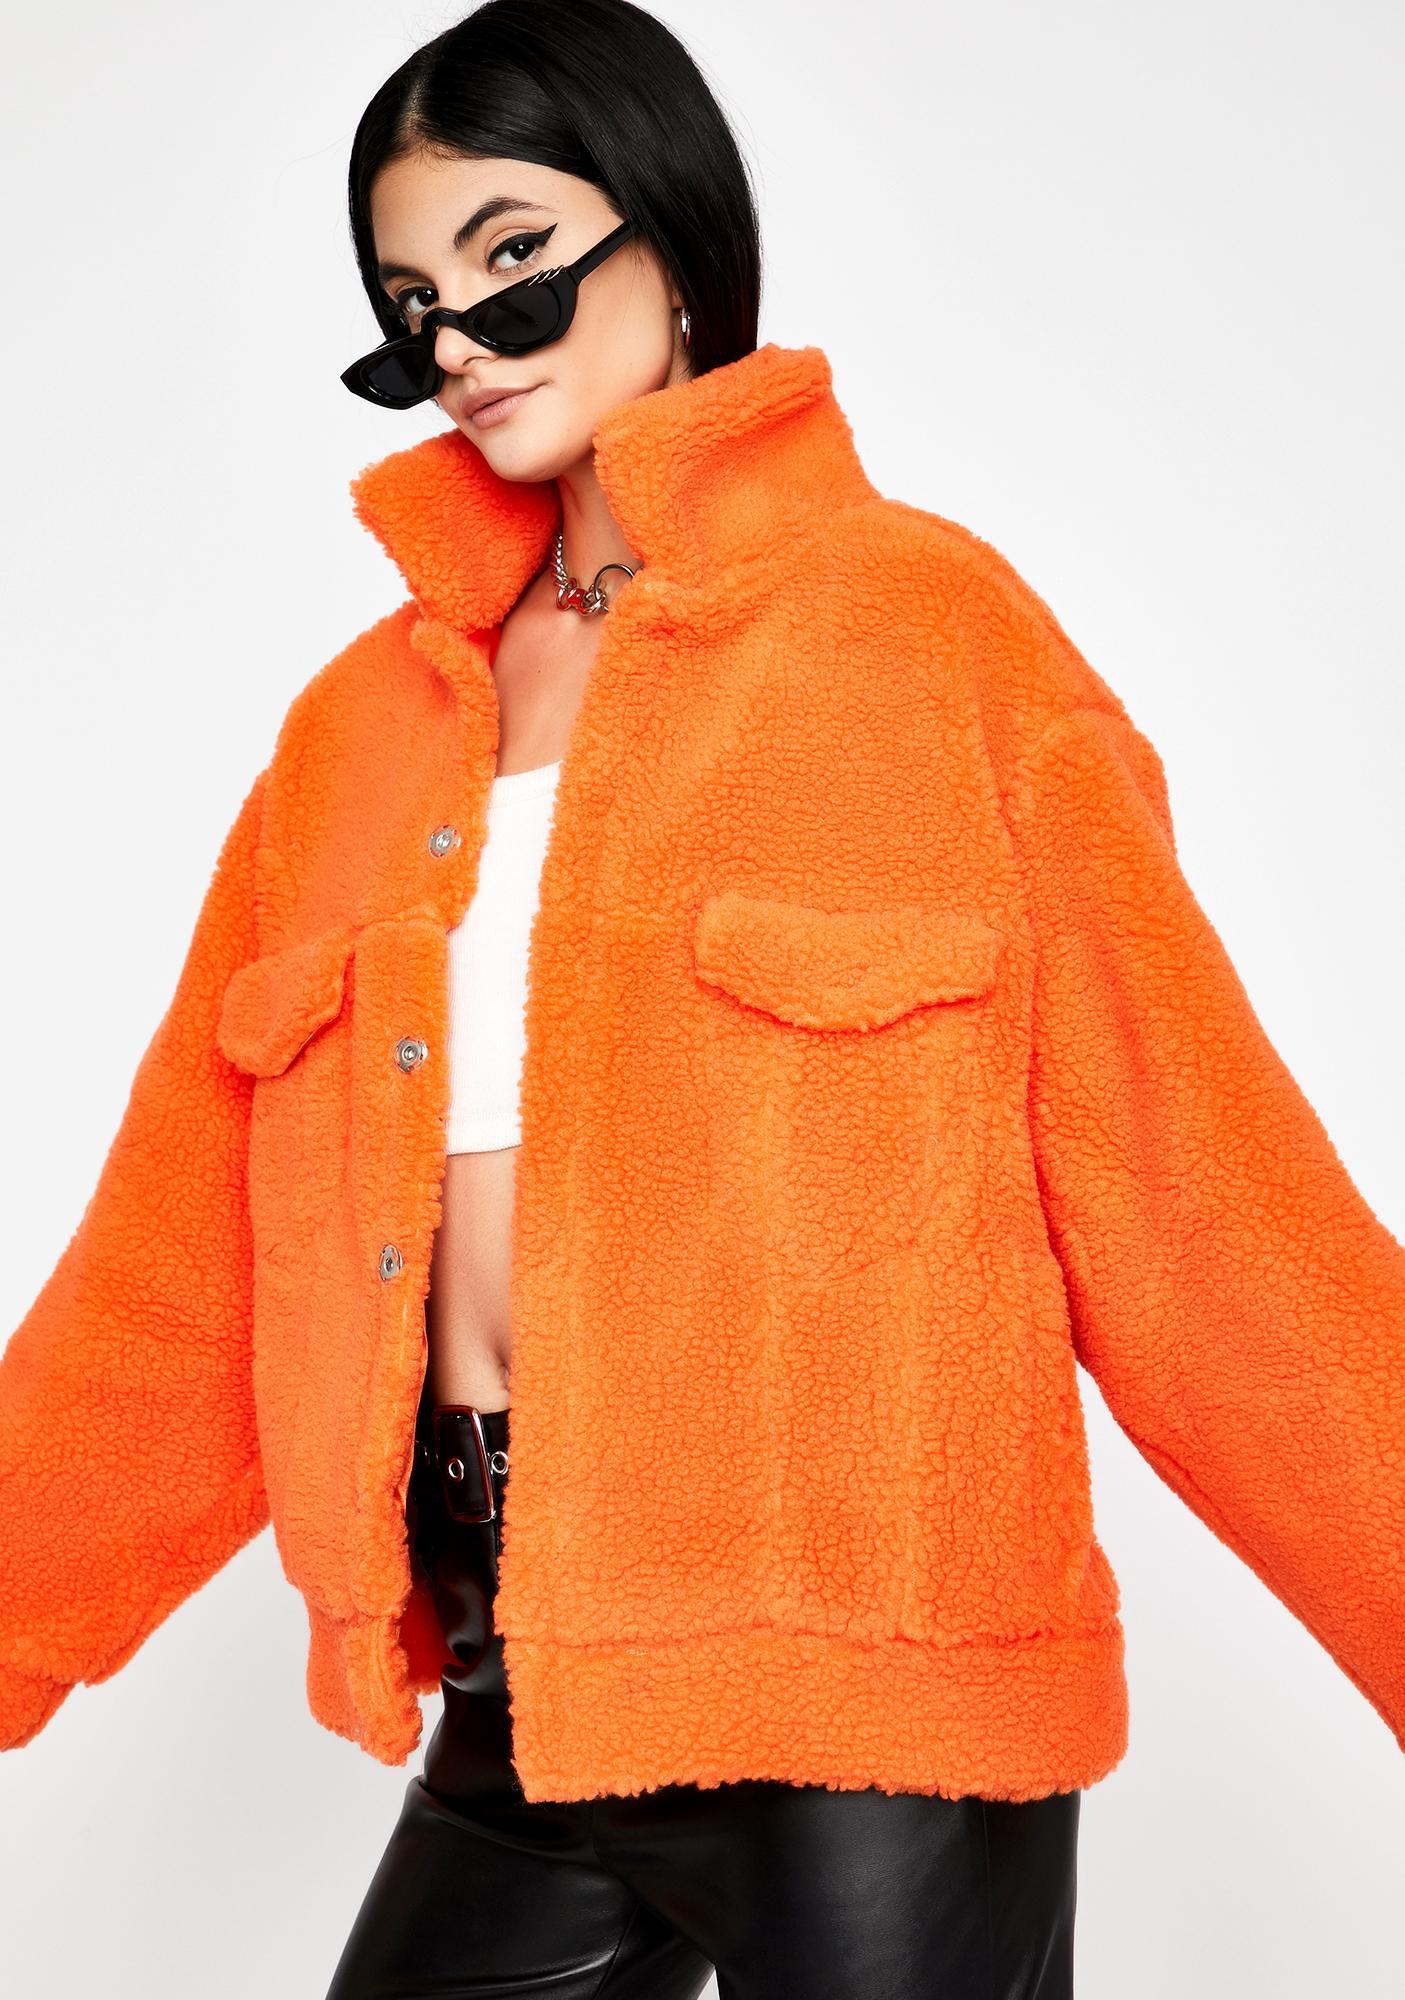 Cloud Puff Sherpa Jacket